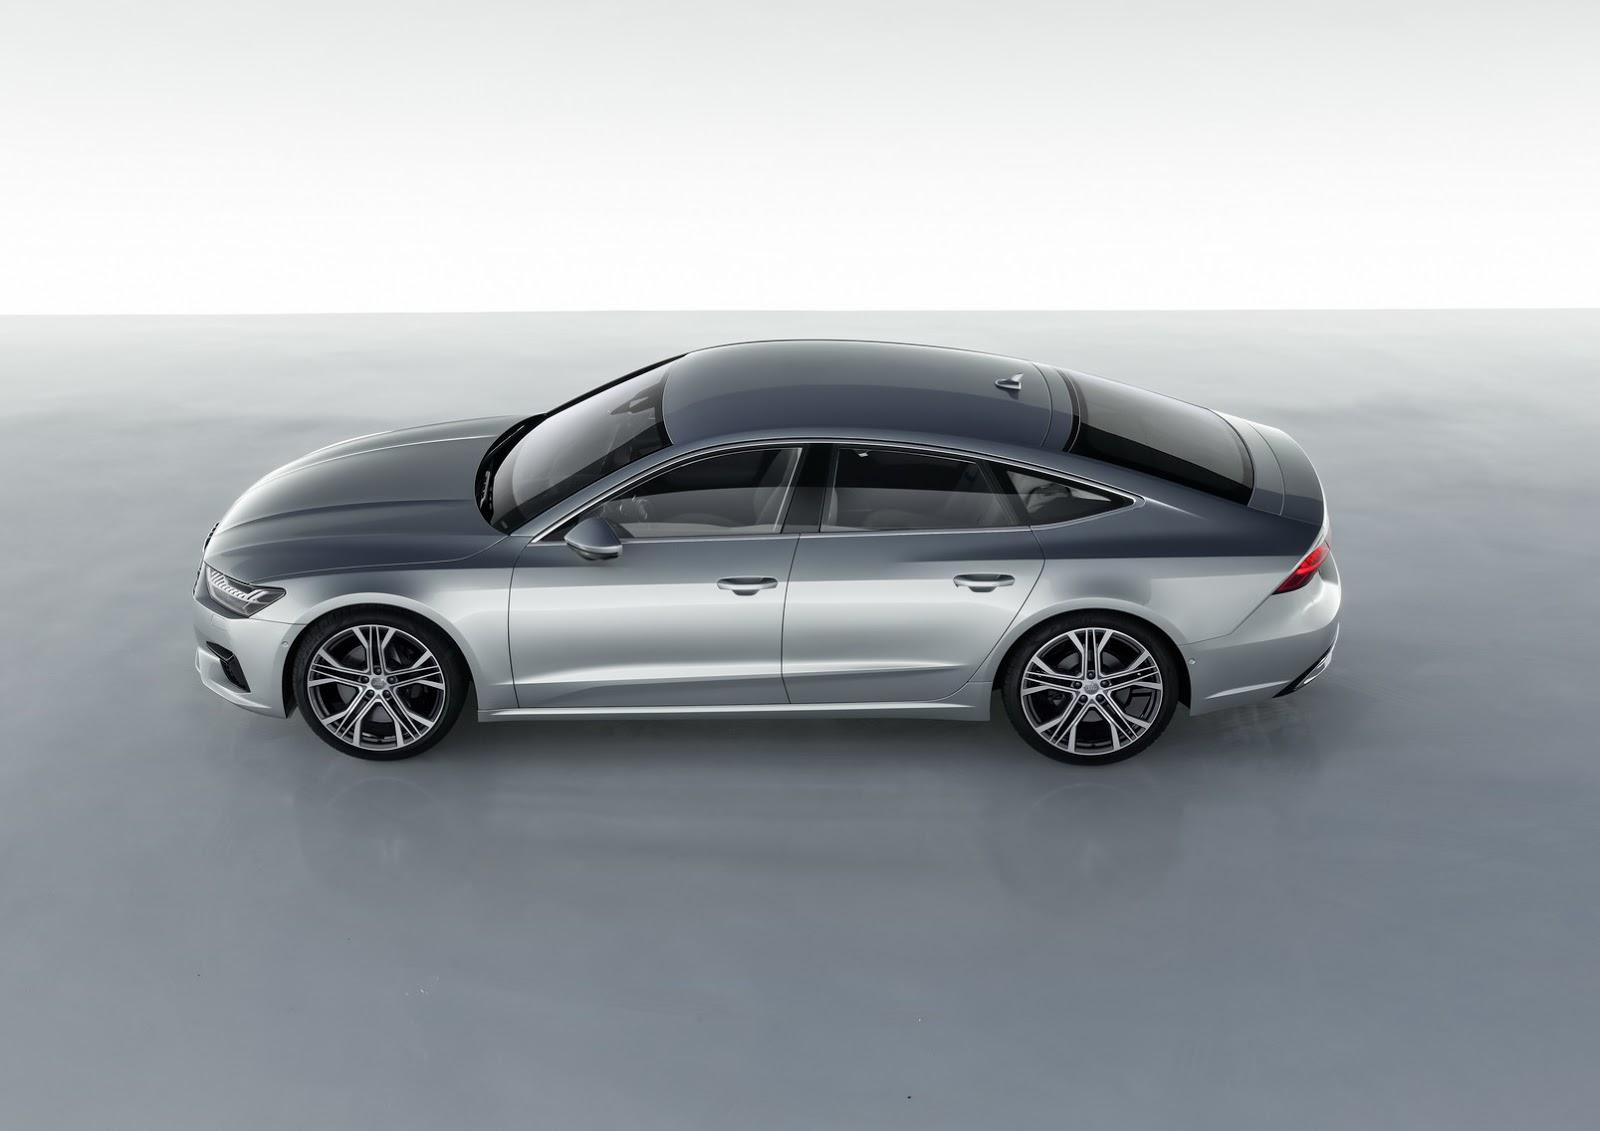 2018_Audi_A7_Sportback_0006